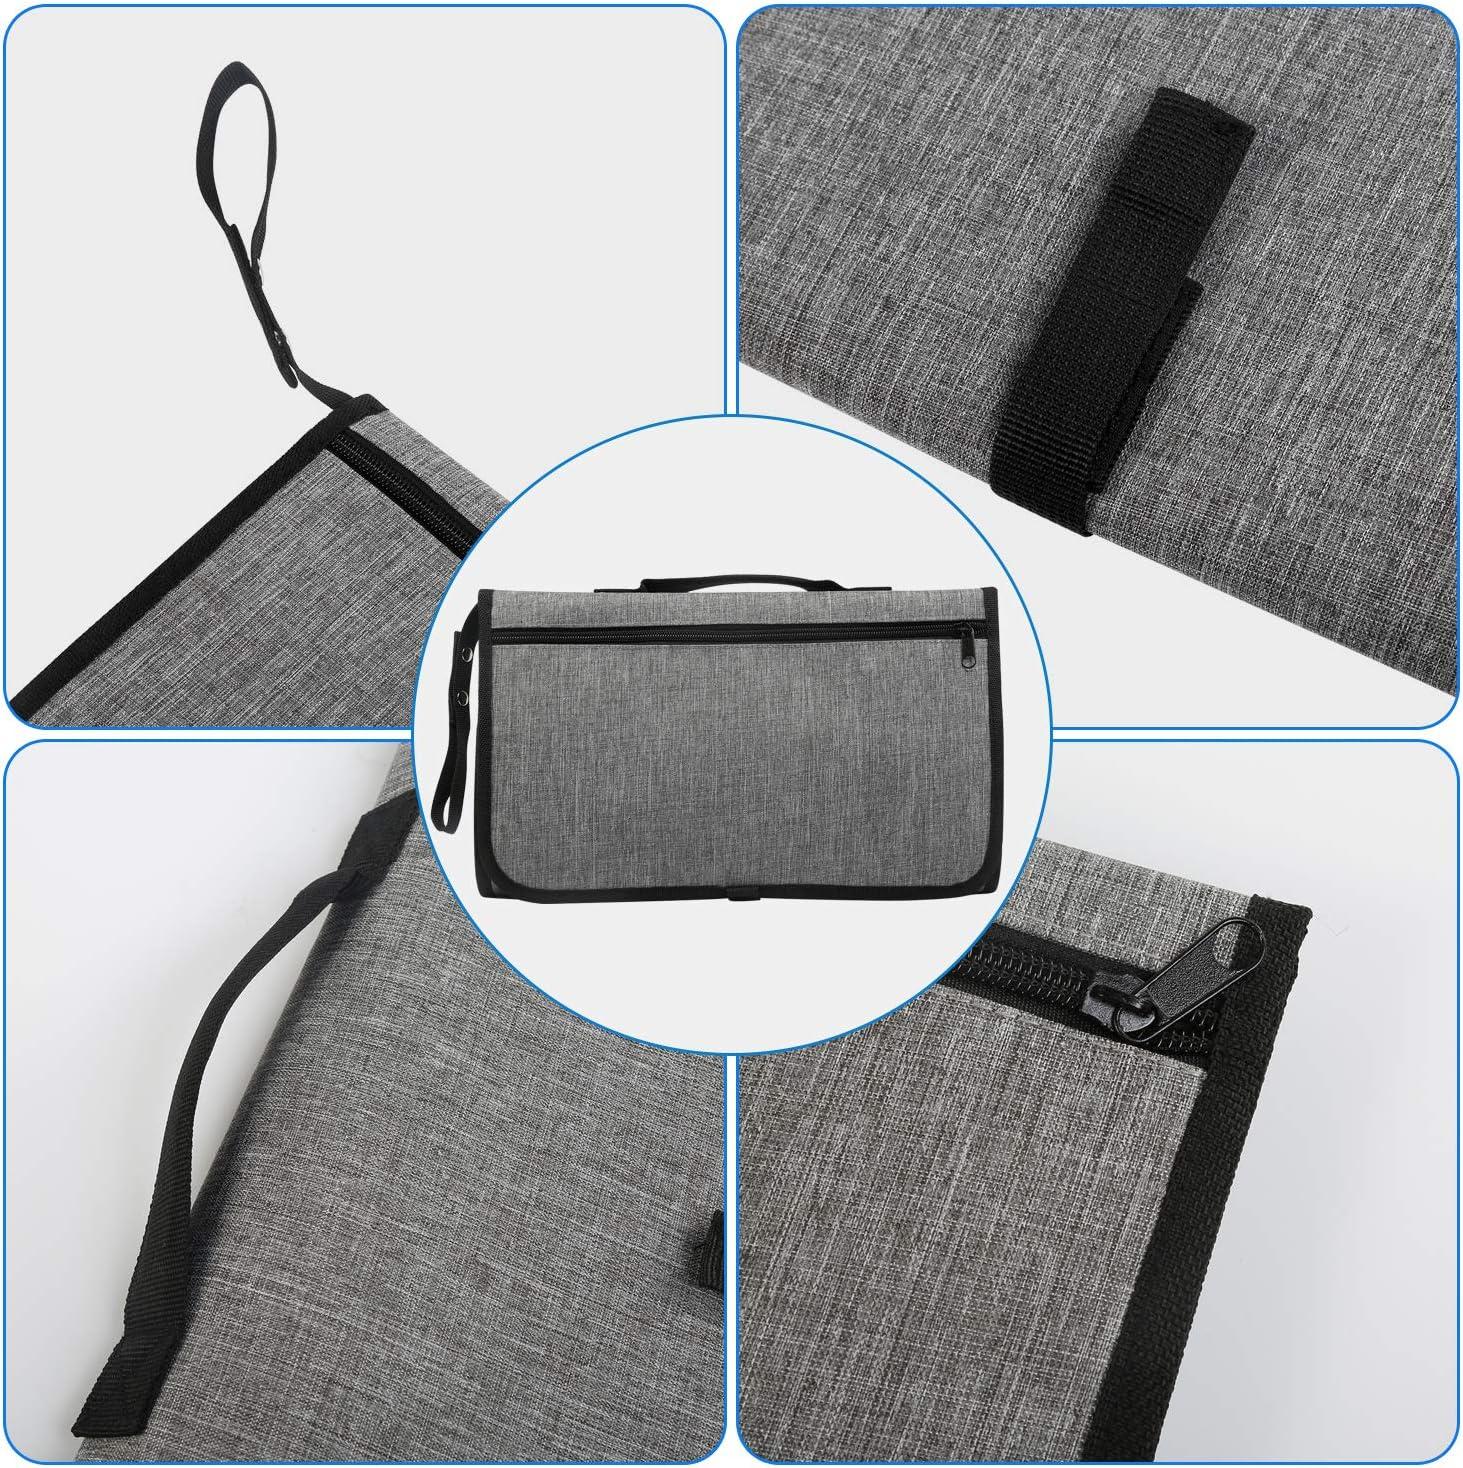 Lavable Plegable Orinal Infantil Pad Kit de Cambiador Para el Hogar Viaje Fuera LEADSTAR Port/átil Cambiador Impermeable Cambiador de Pa/ñales para Beb/é Cambiador de Viaje Gris